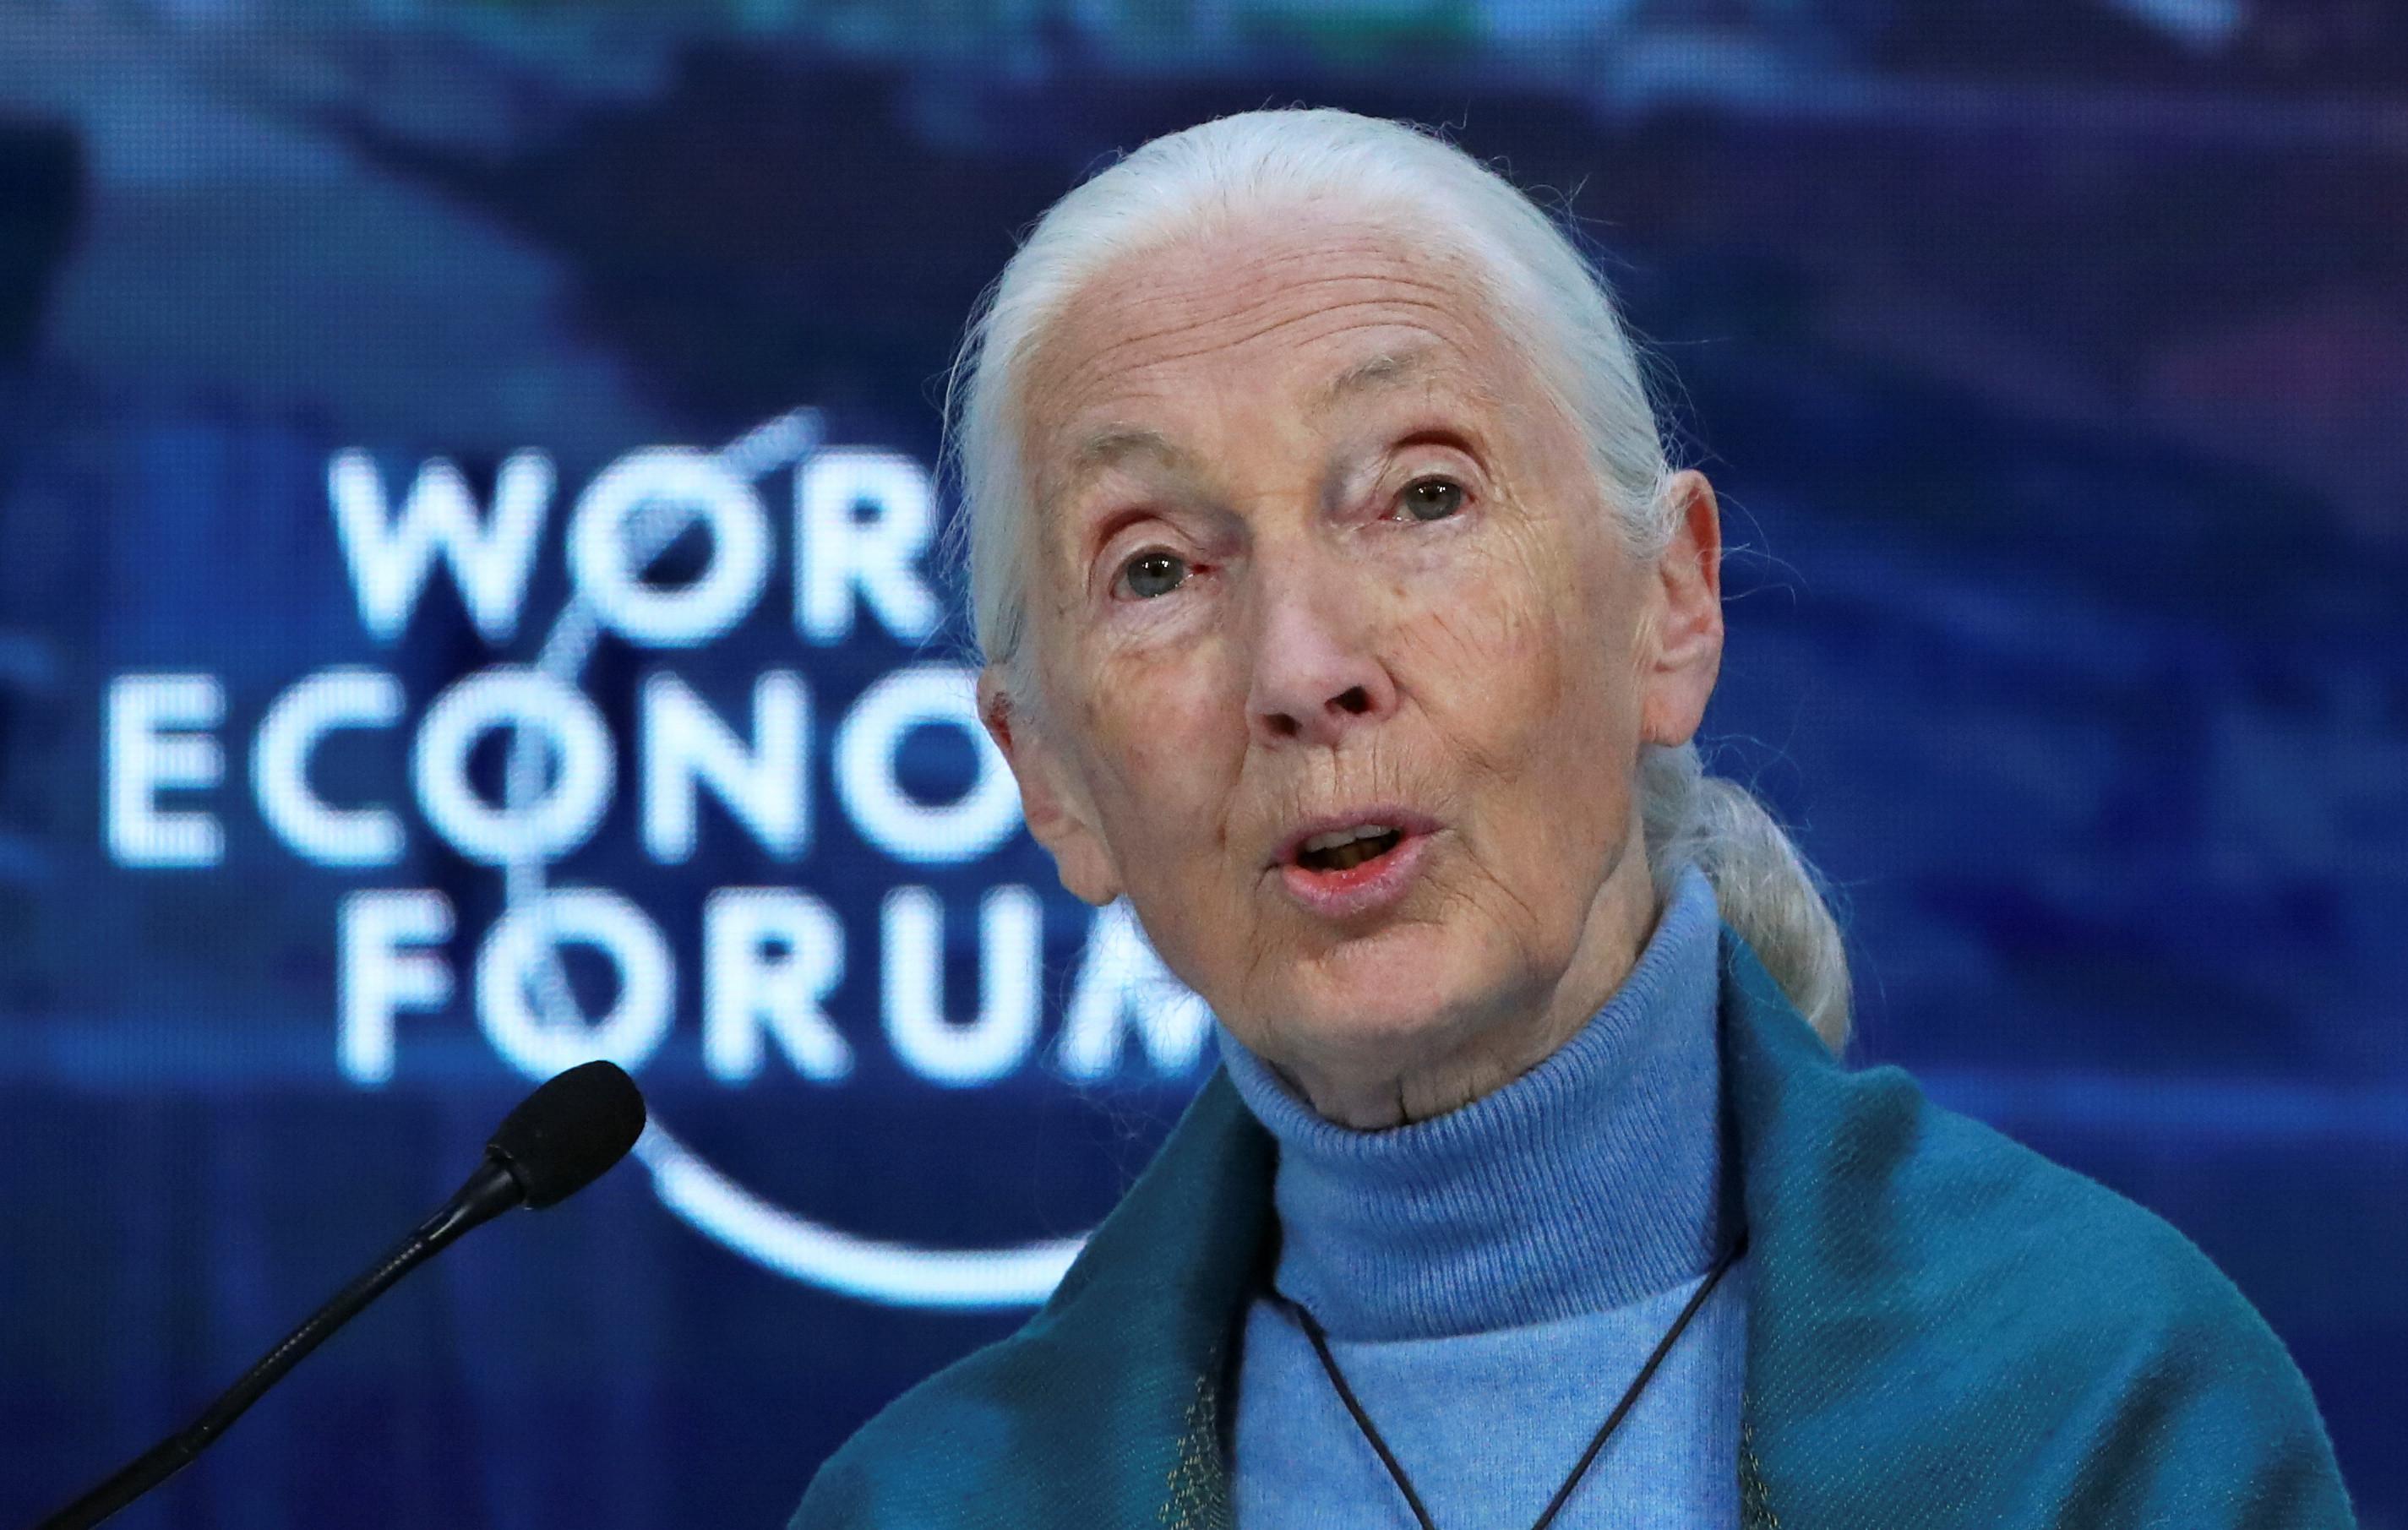 British primatologist, ethologist and anthropologist Jane Goodall has won the Templeton Prize 2021.